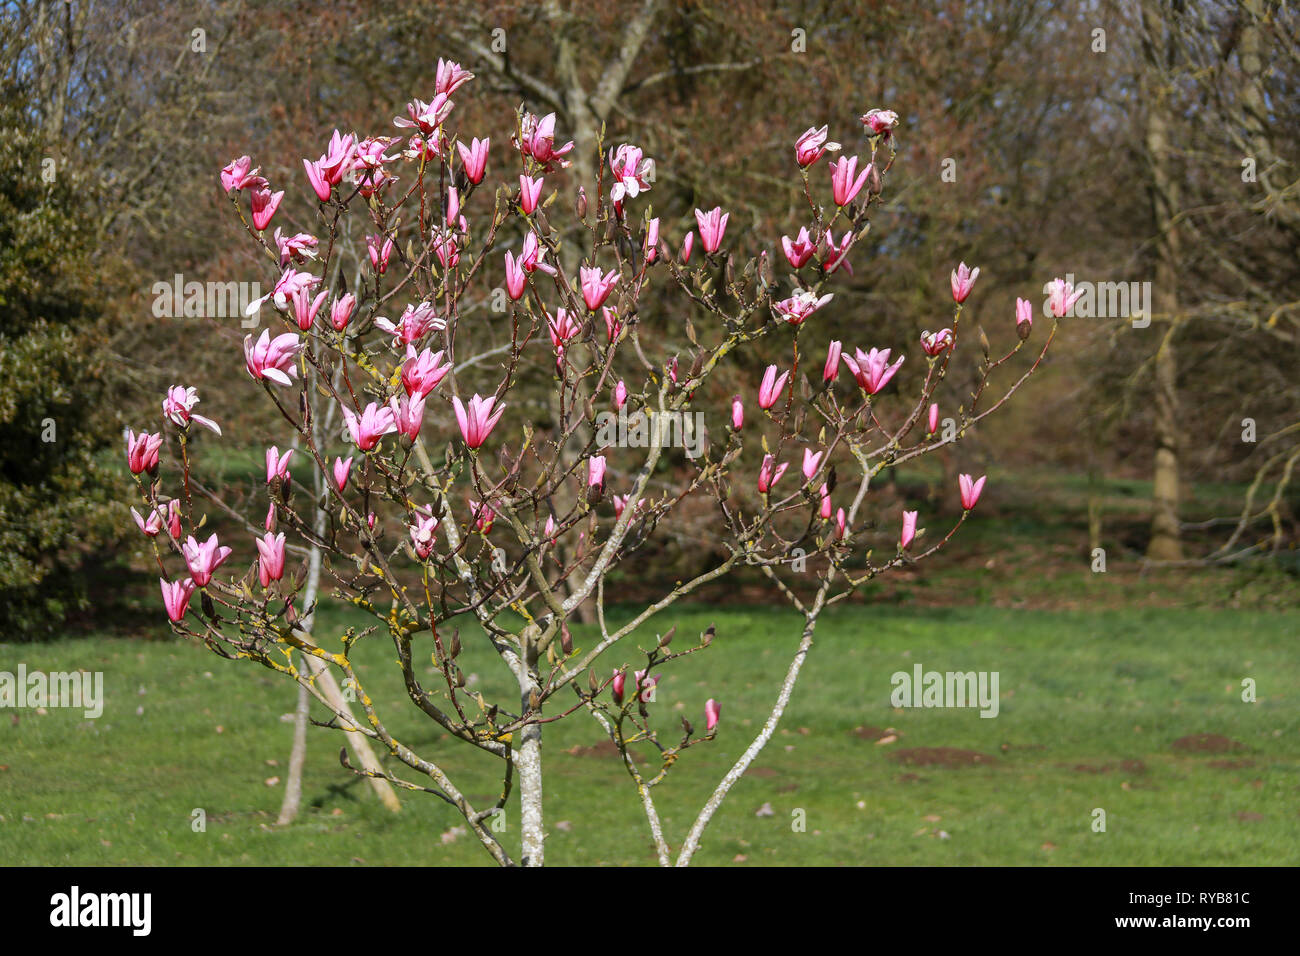 Small Pink Magnolia Tree Bush In The Sun In Flower In Oxford